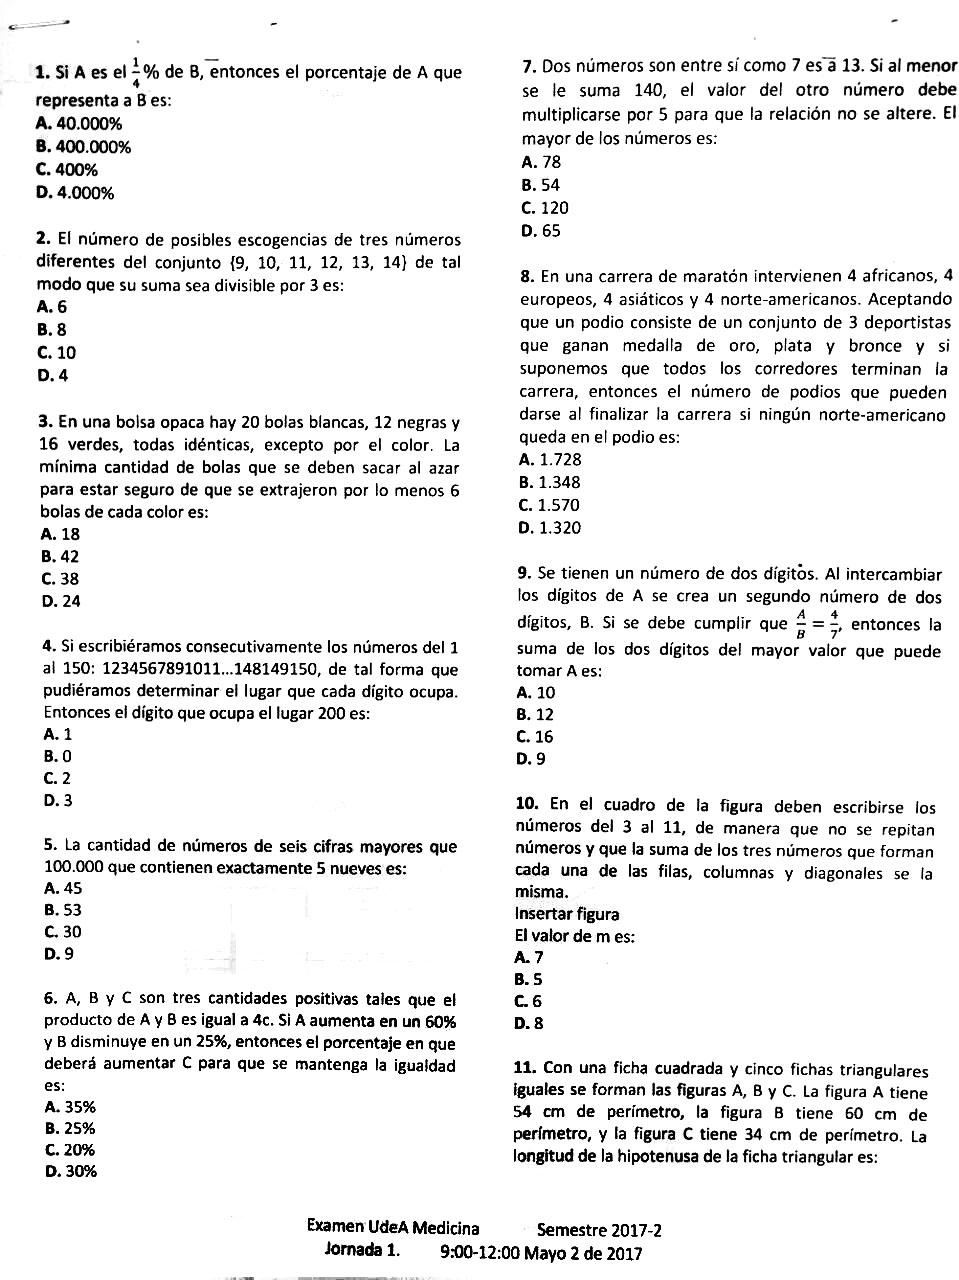 Examen admisi n udea resuelto pdf blog del profe alex for Examen para plazas docentes 2017